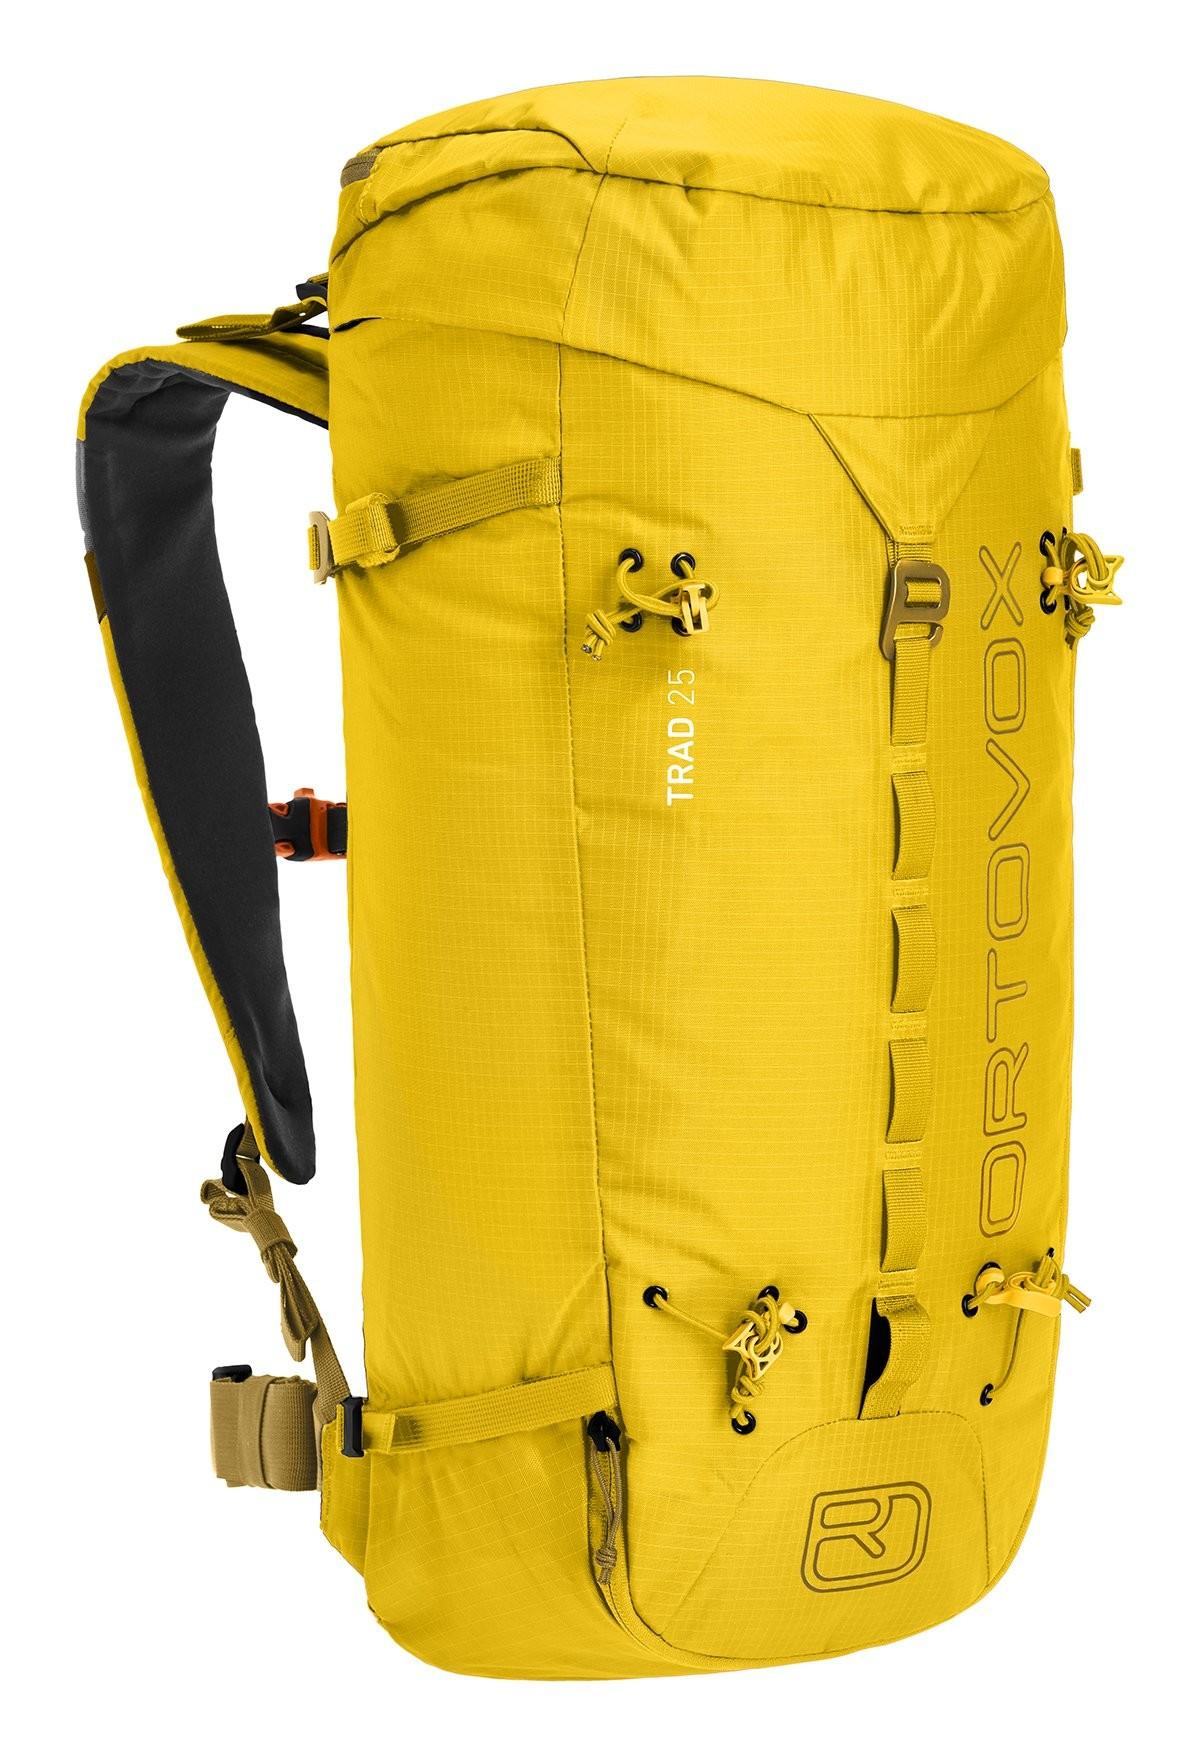 Ortovox Trad 25 - Climbing backpack